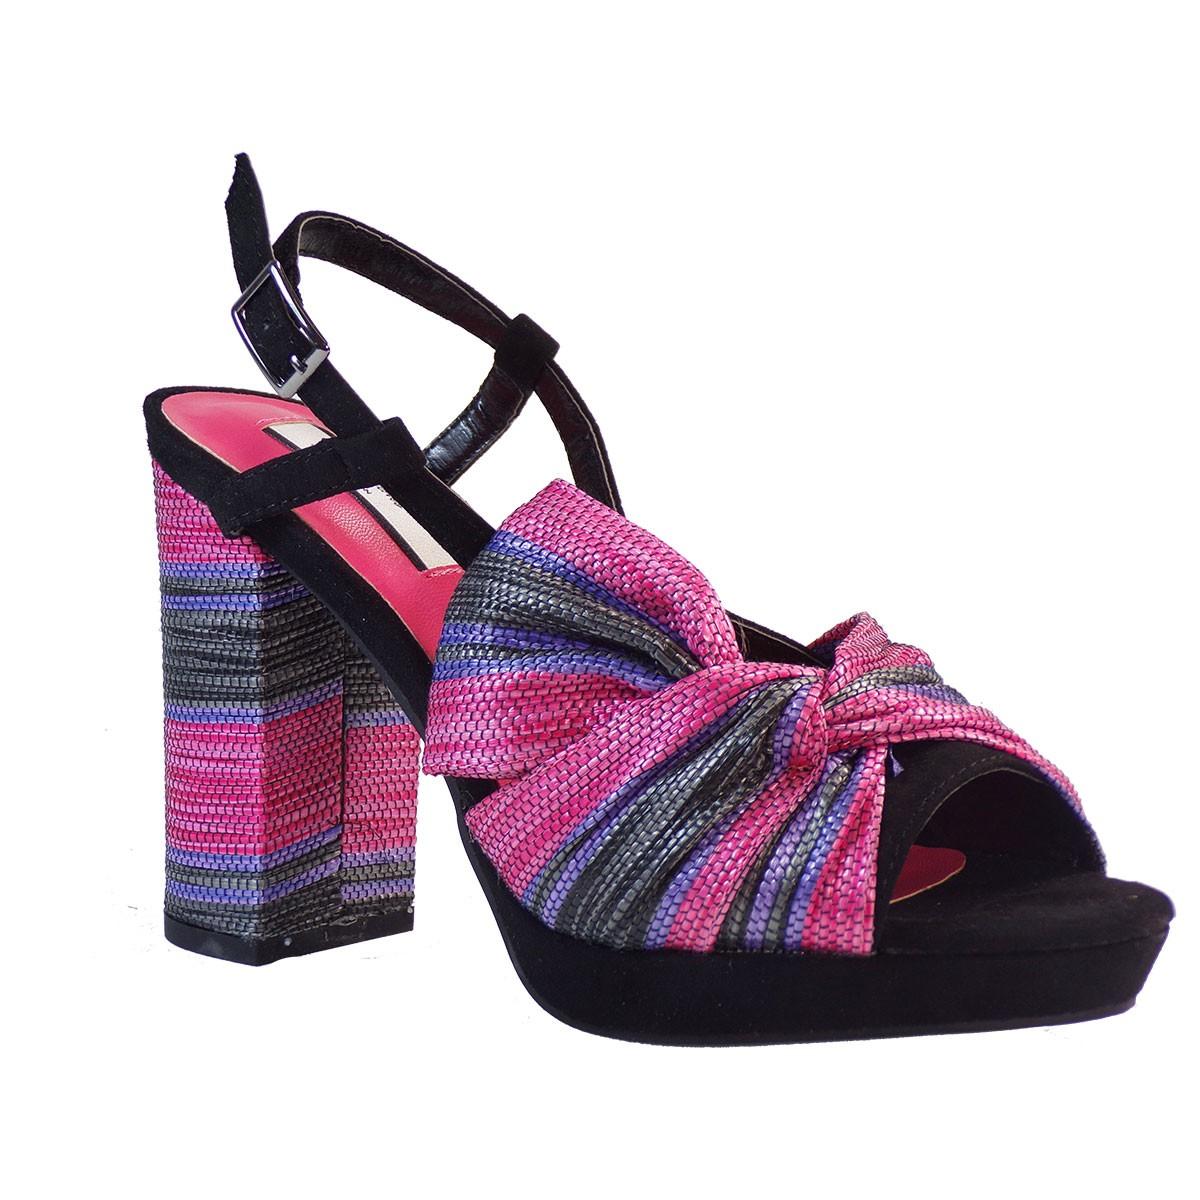 f07864f171 Pepe Jeans NIKA KNOT Γυναικεία Παπούτσια Πέδιλα PLS90400-999 Μαύρο –  IShoeStore